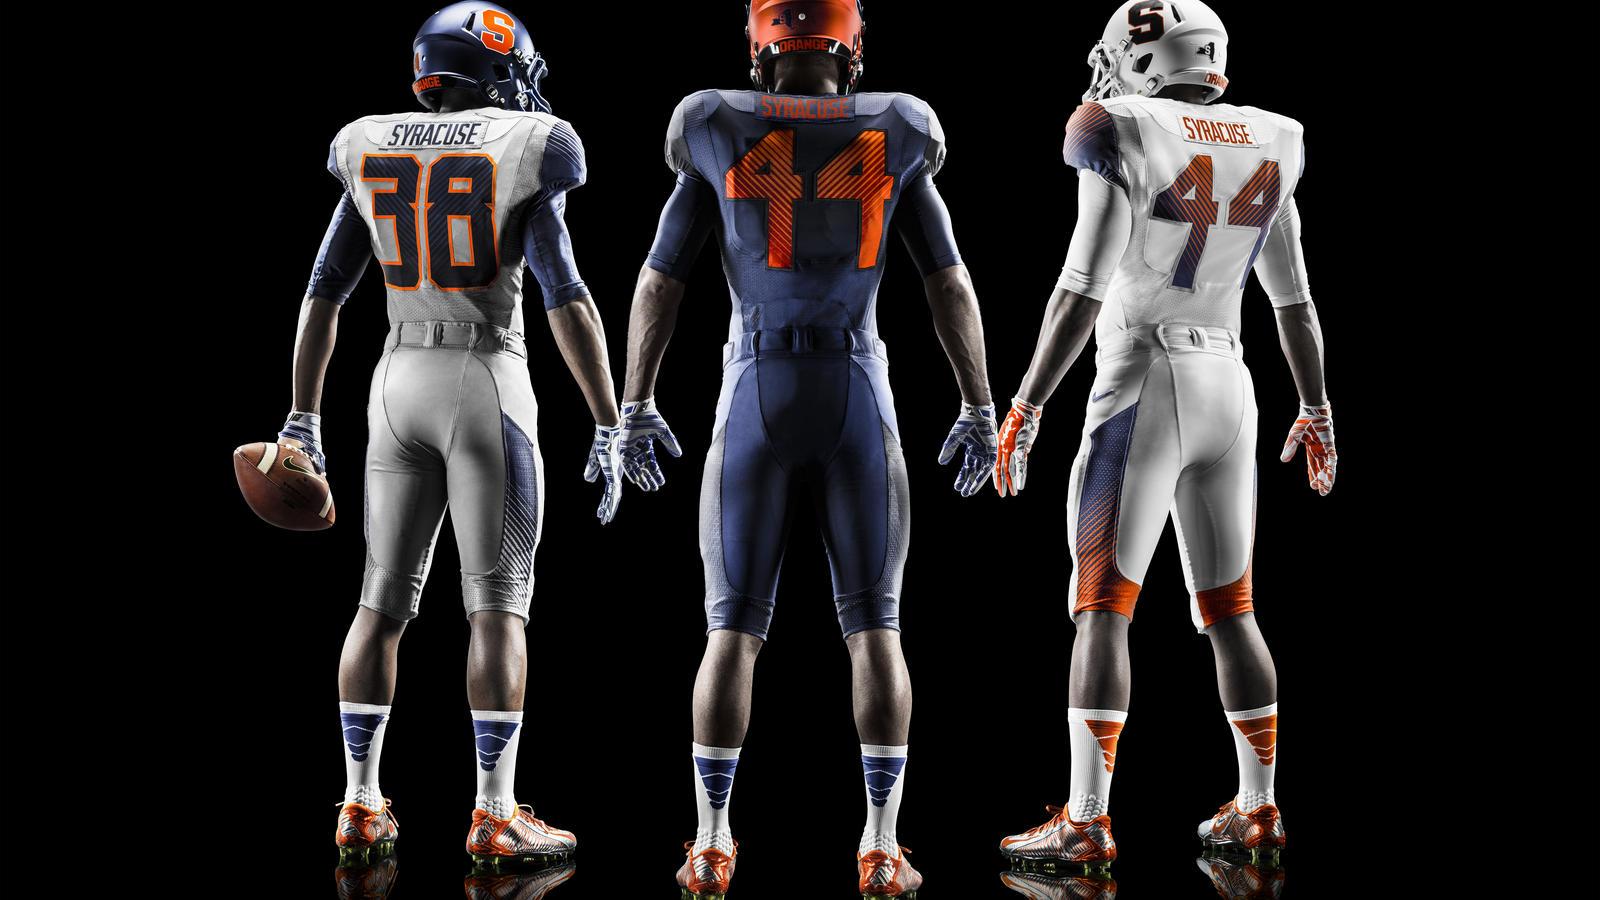 newest 7e8a8 8818e Syracuse Unveils New 2014 Nike Football Uniforms - Nike News